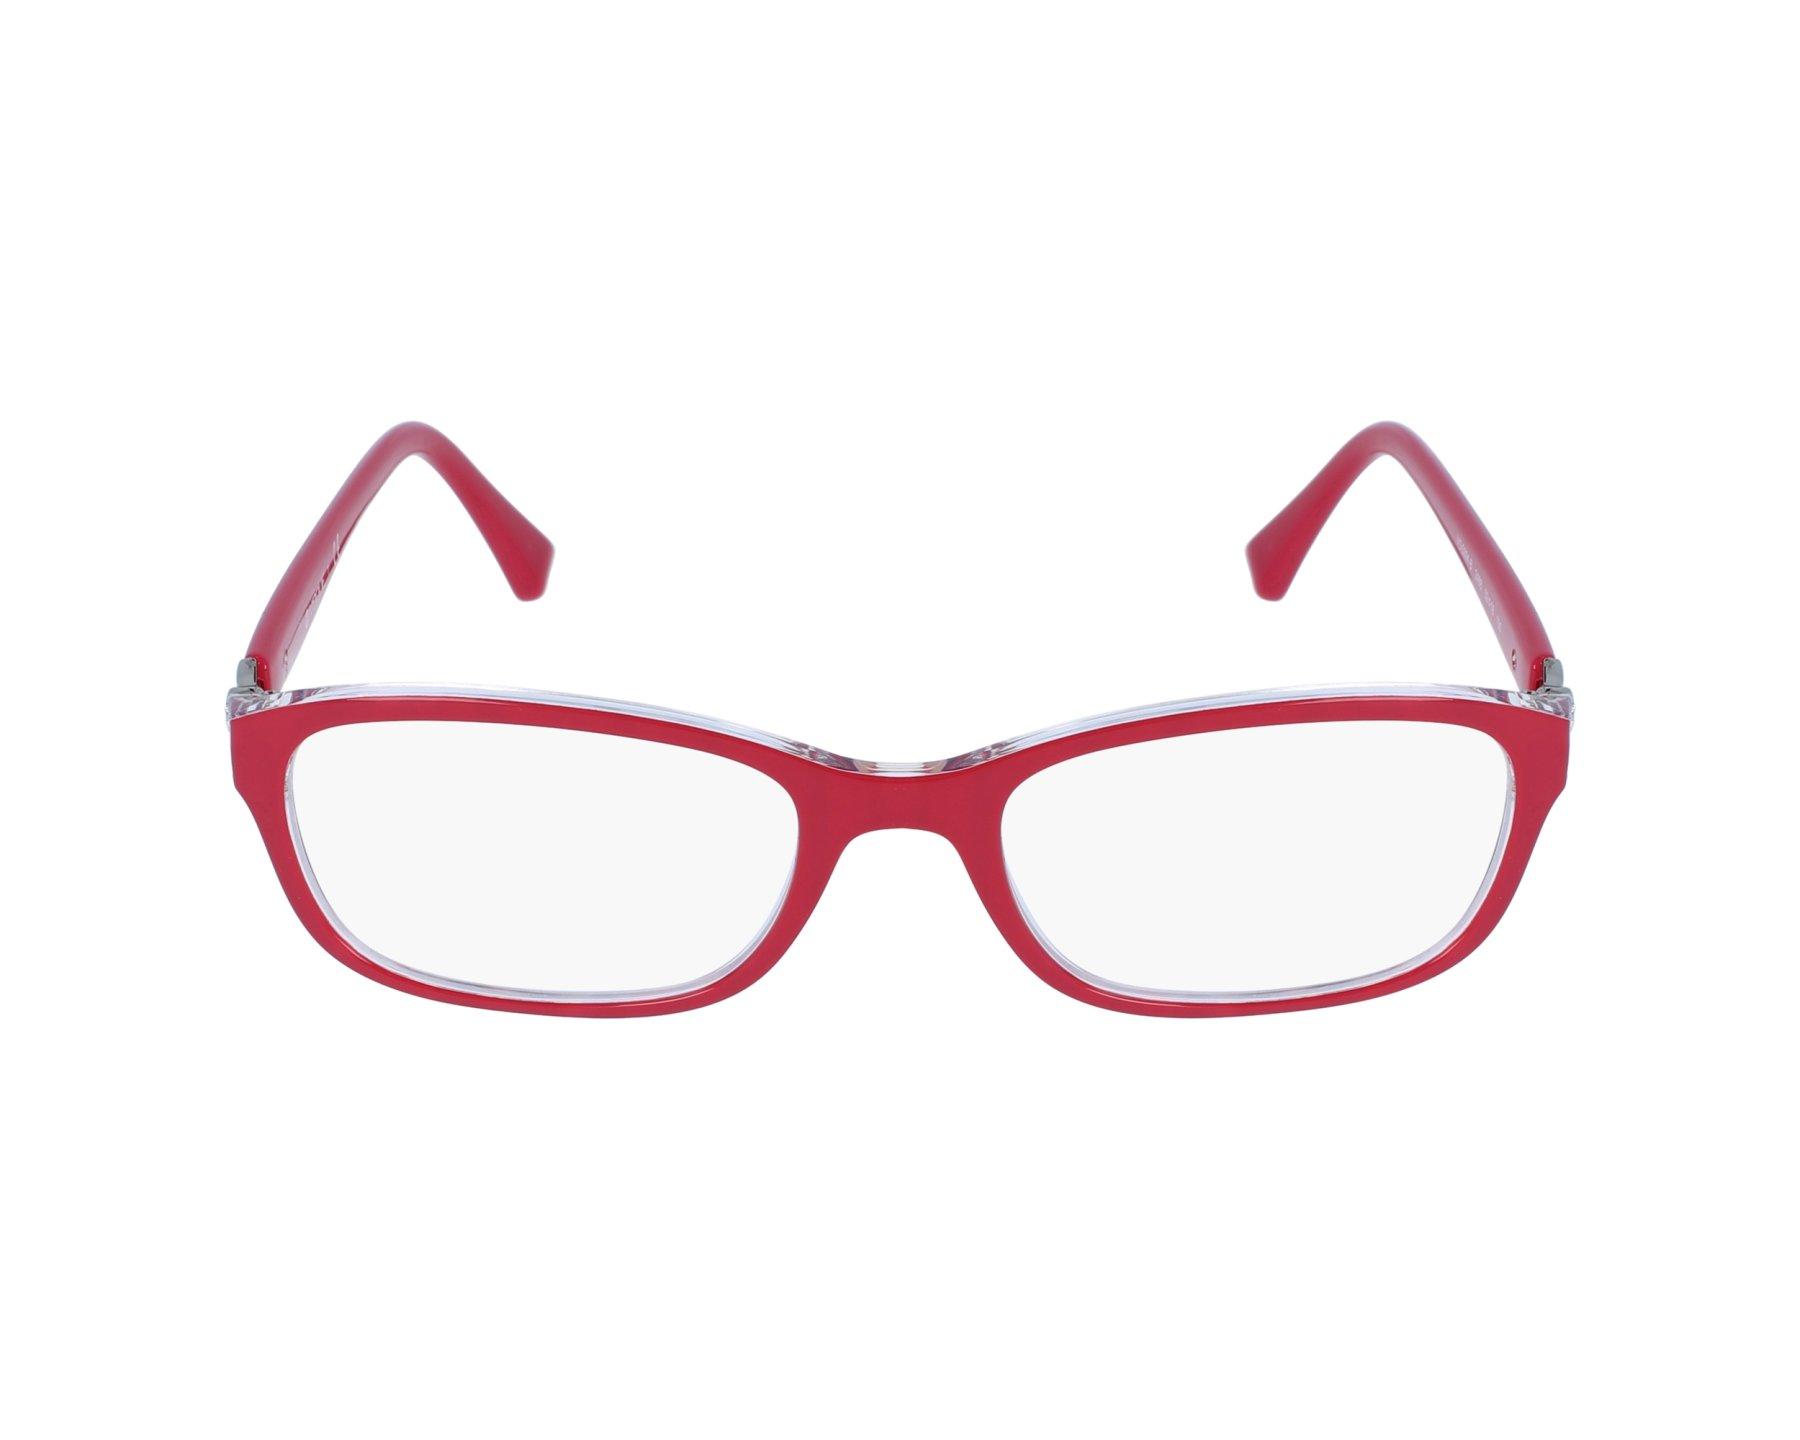 eyeglasses Vogue VO-5094-B 2468 - Pink profile view